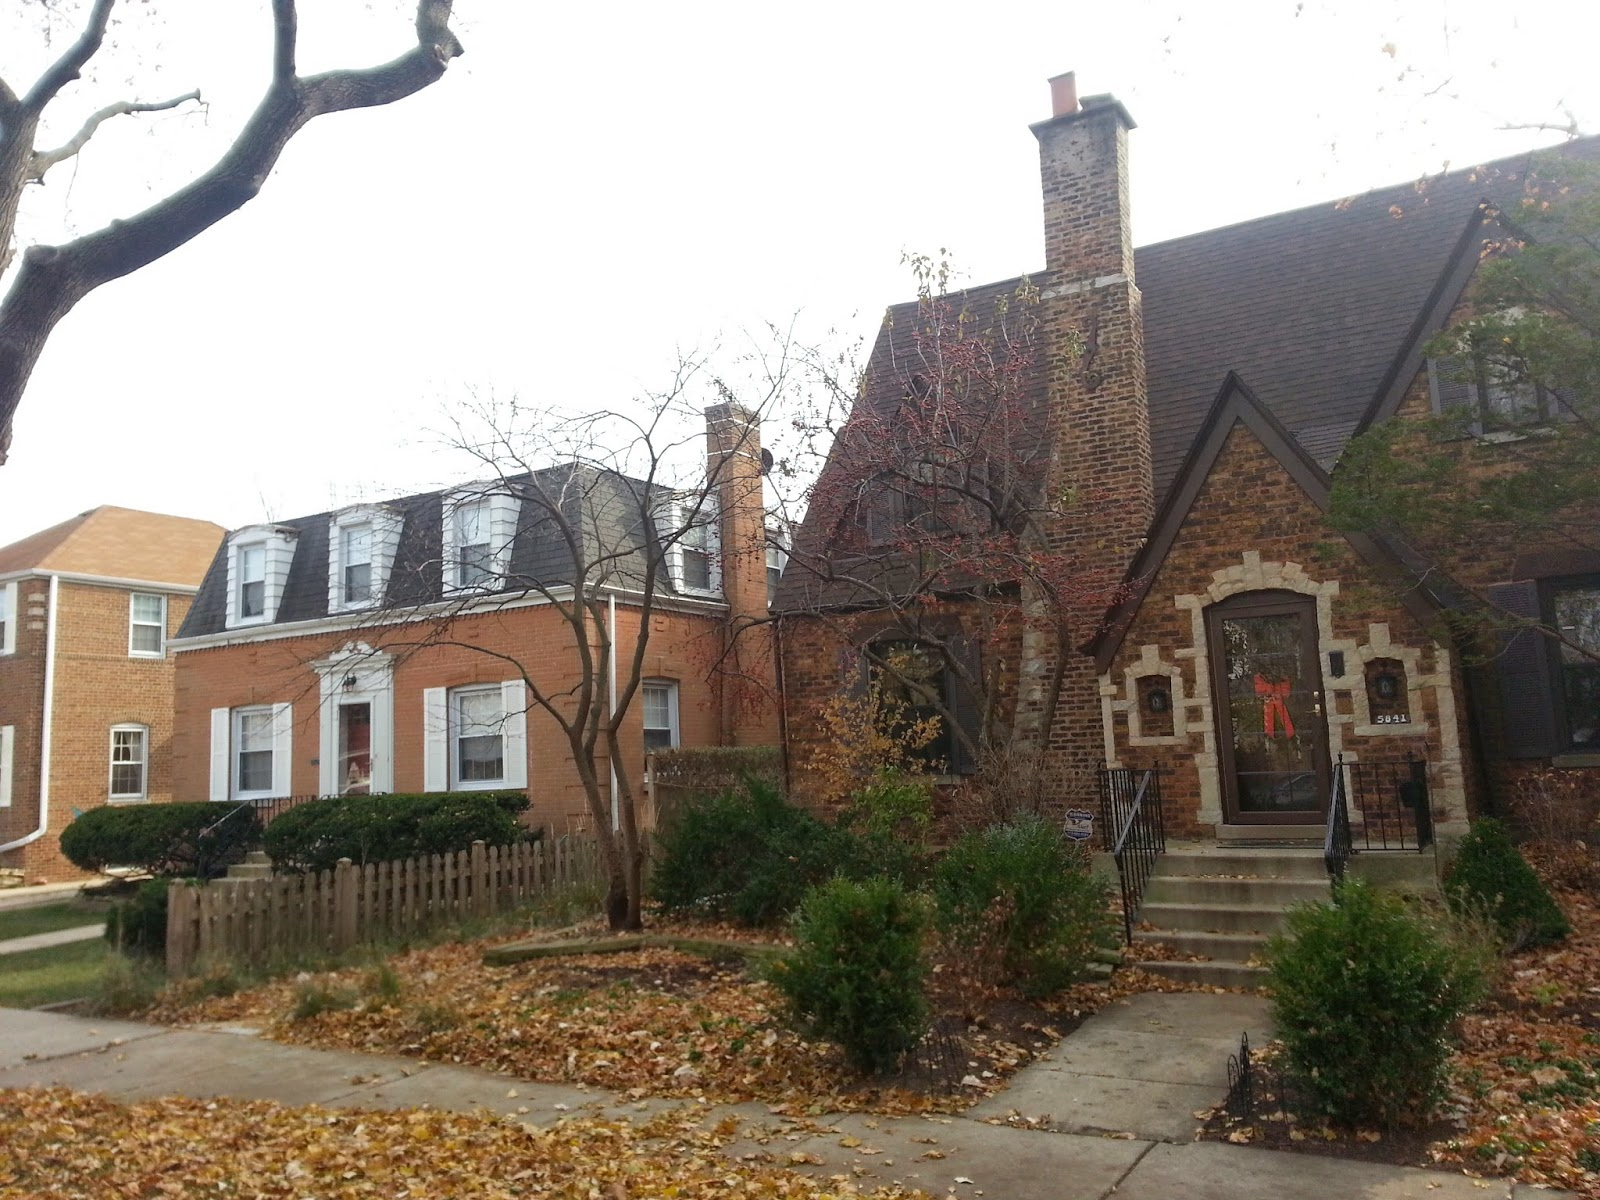 Chicago best neighborhood for dating